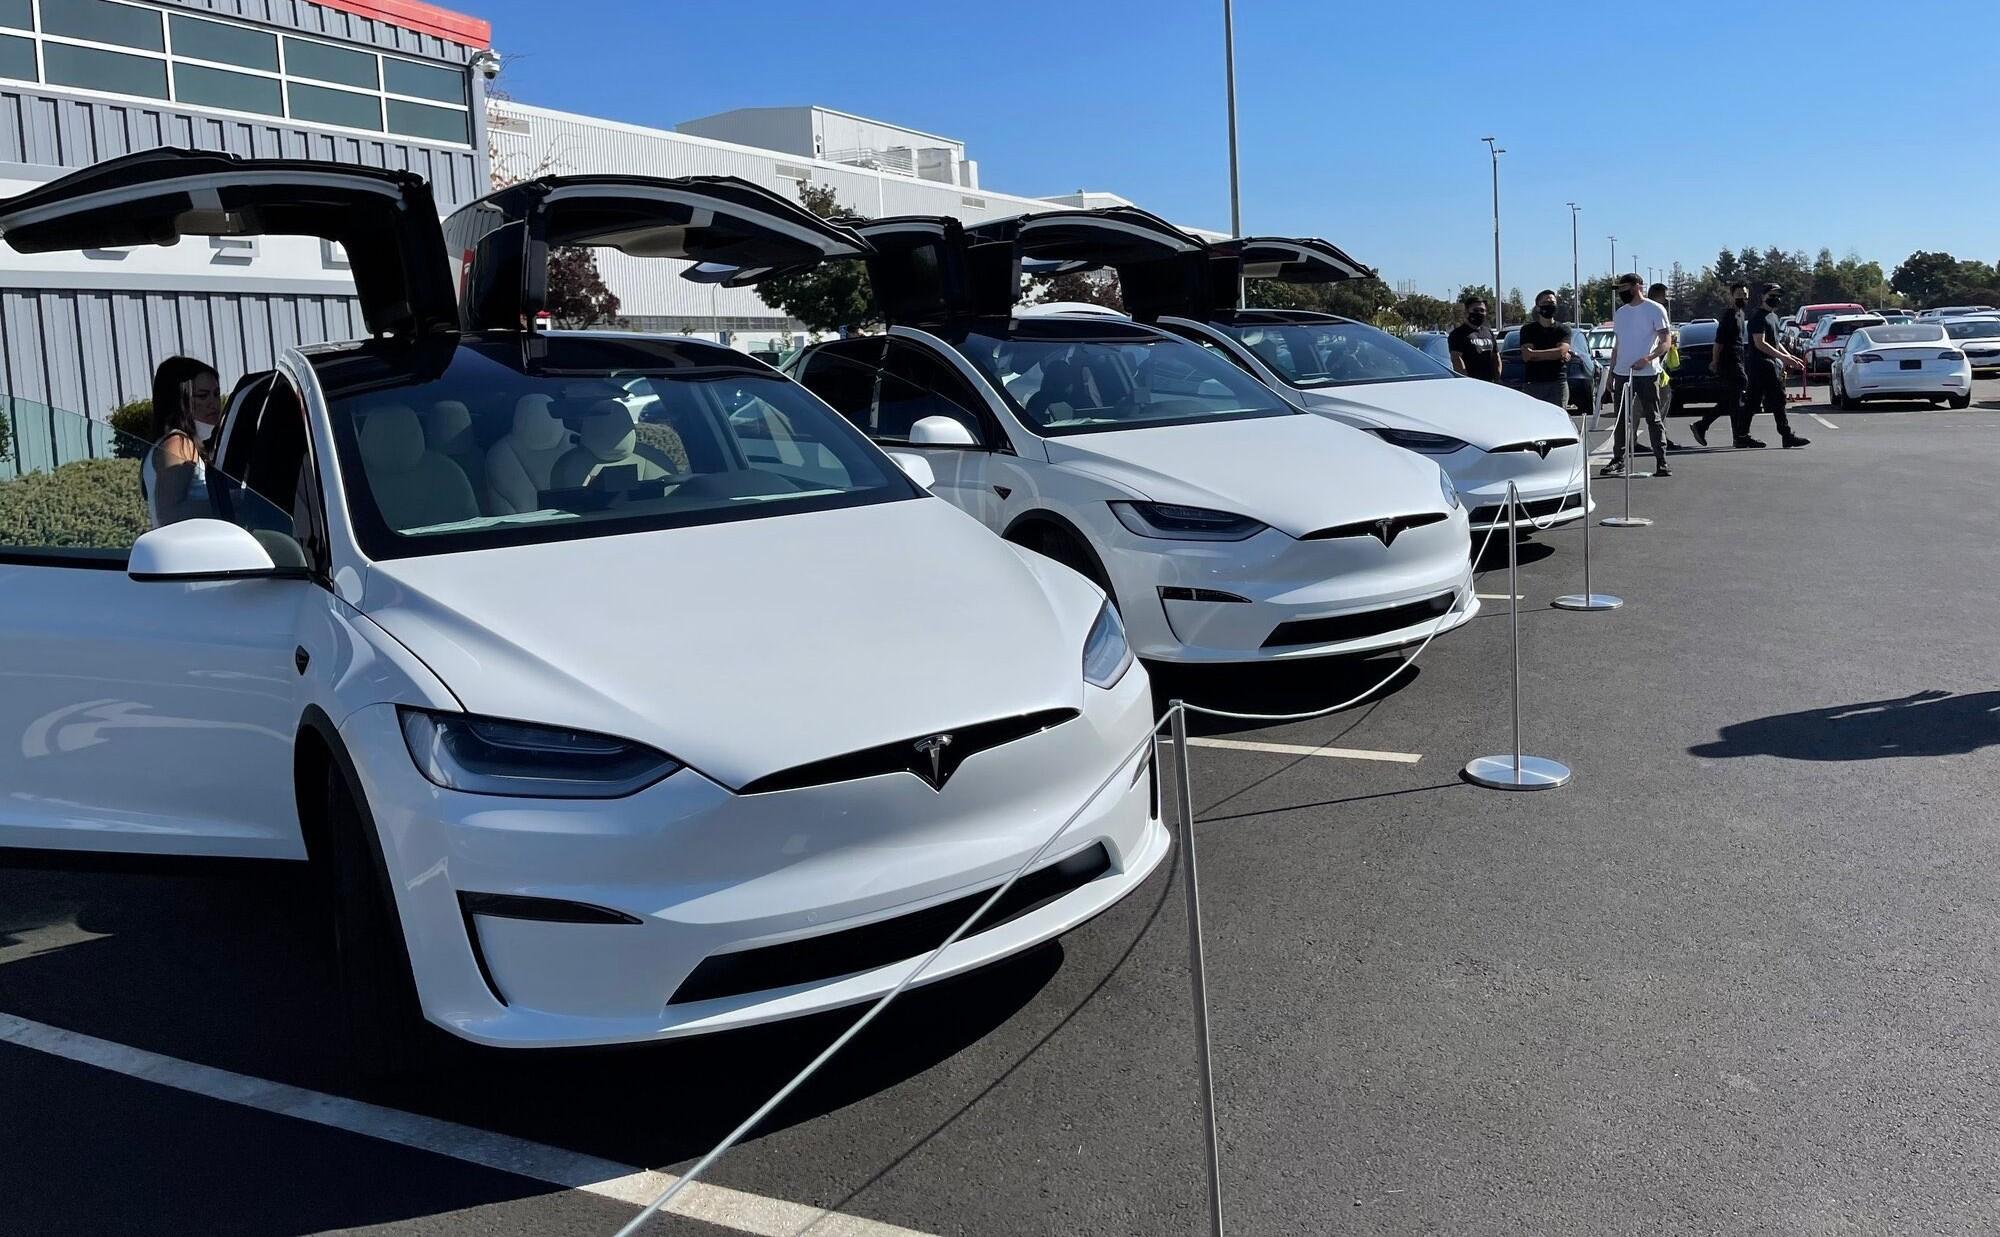 New Tesla Model X deliveries begin at Fremont, and it's better than ever - Teslarati